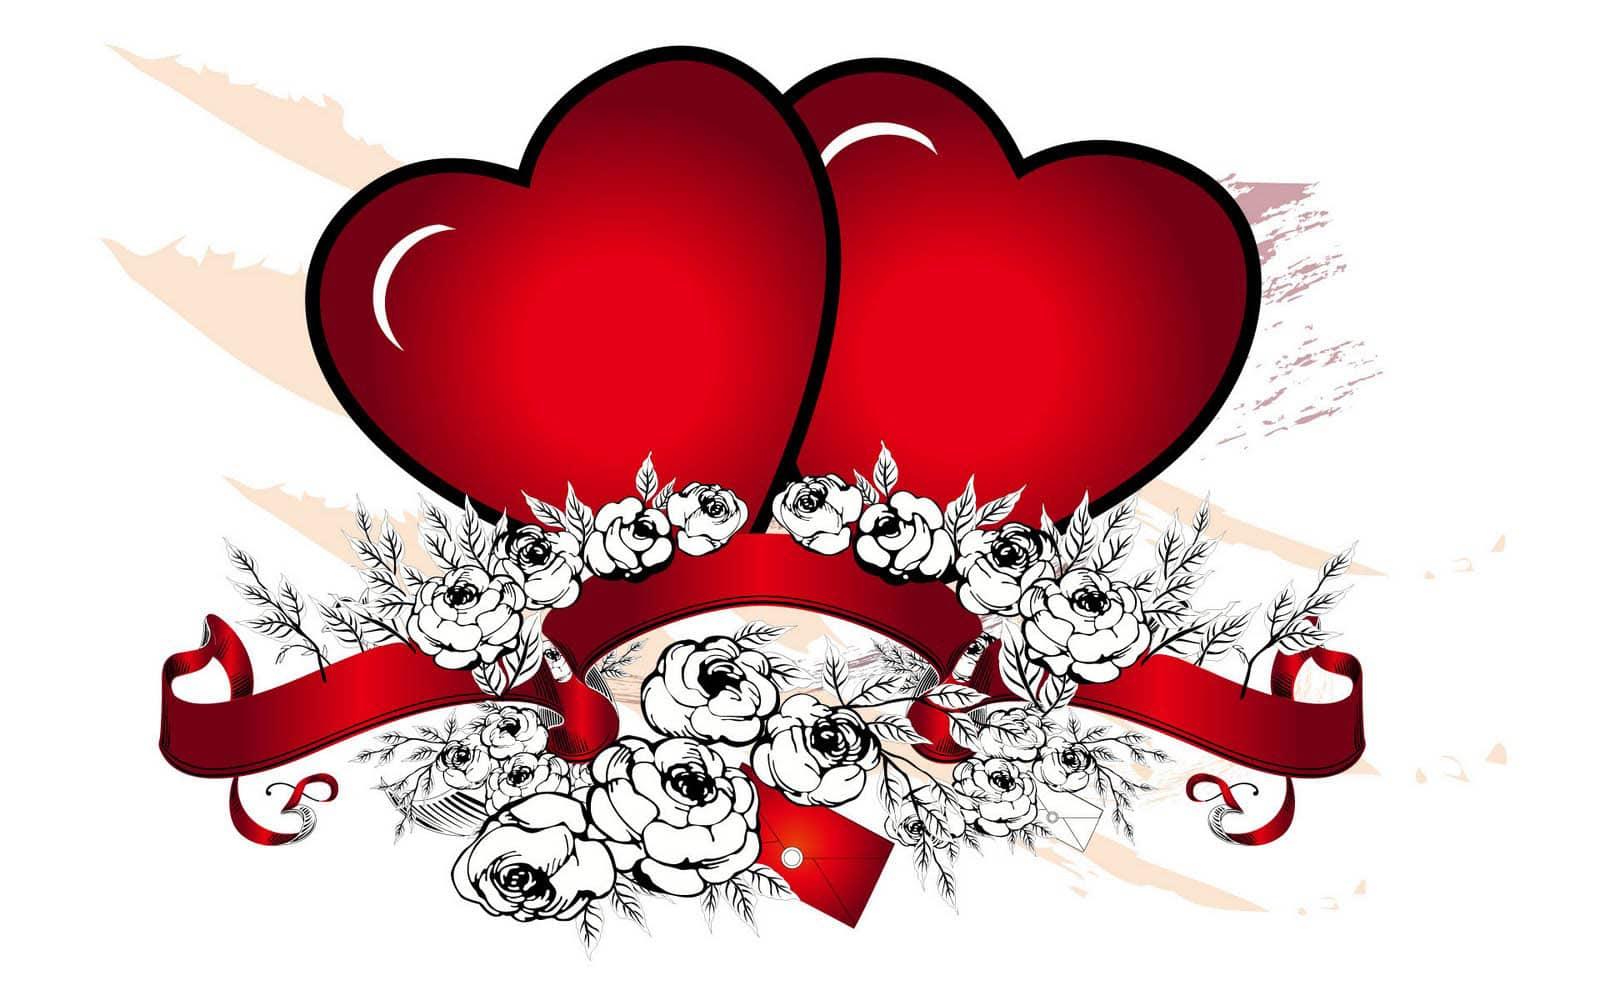 Love wallpaper, imagine Love wallpaper